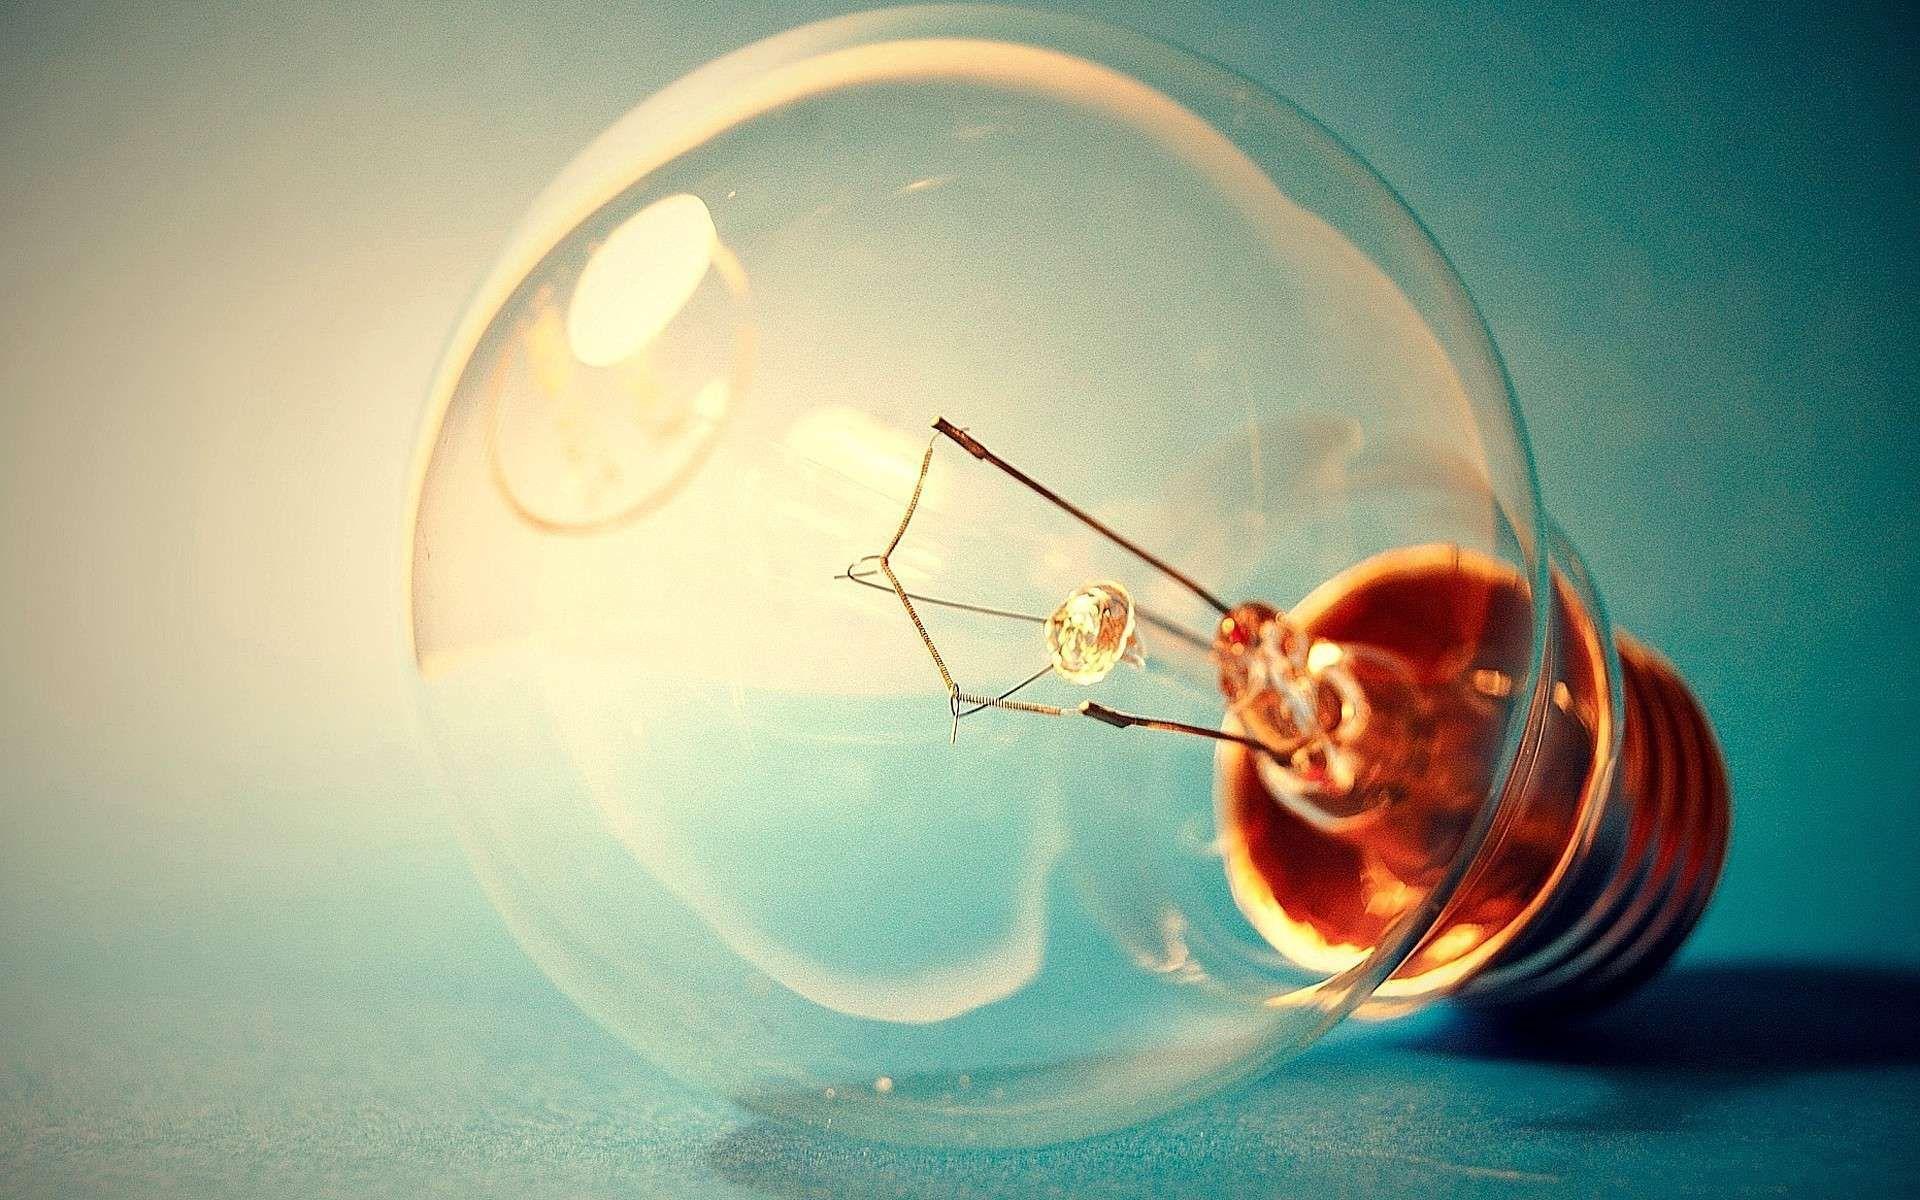 1000 images about lightbulb things on pinterest lightbulbs bulbs - 30 Light Bulb Wallpaper By Severin Baroch Goldwallpapers